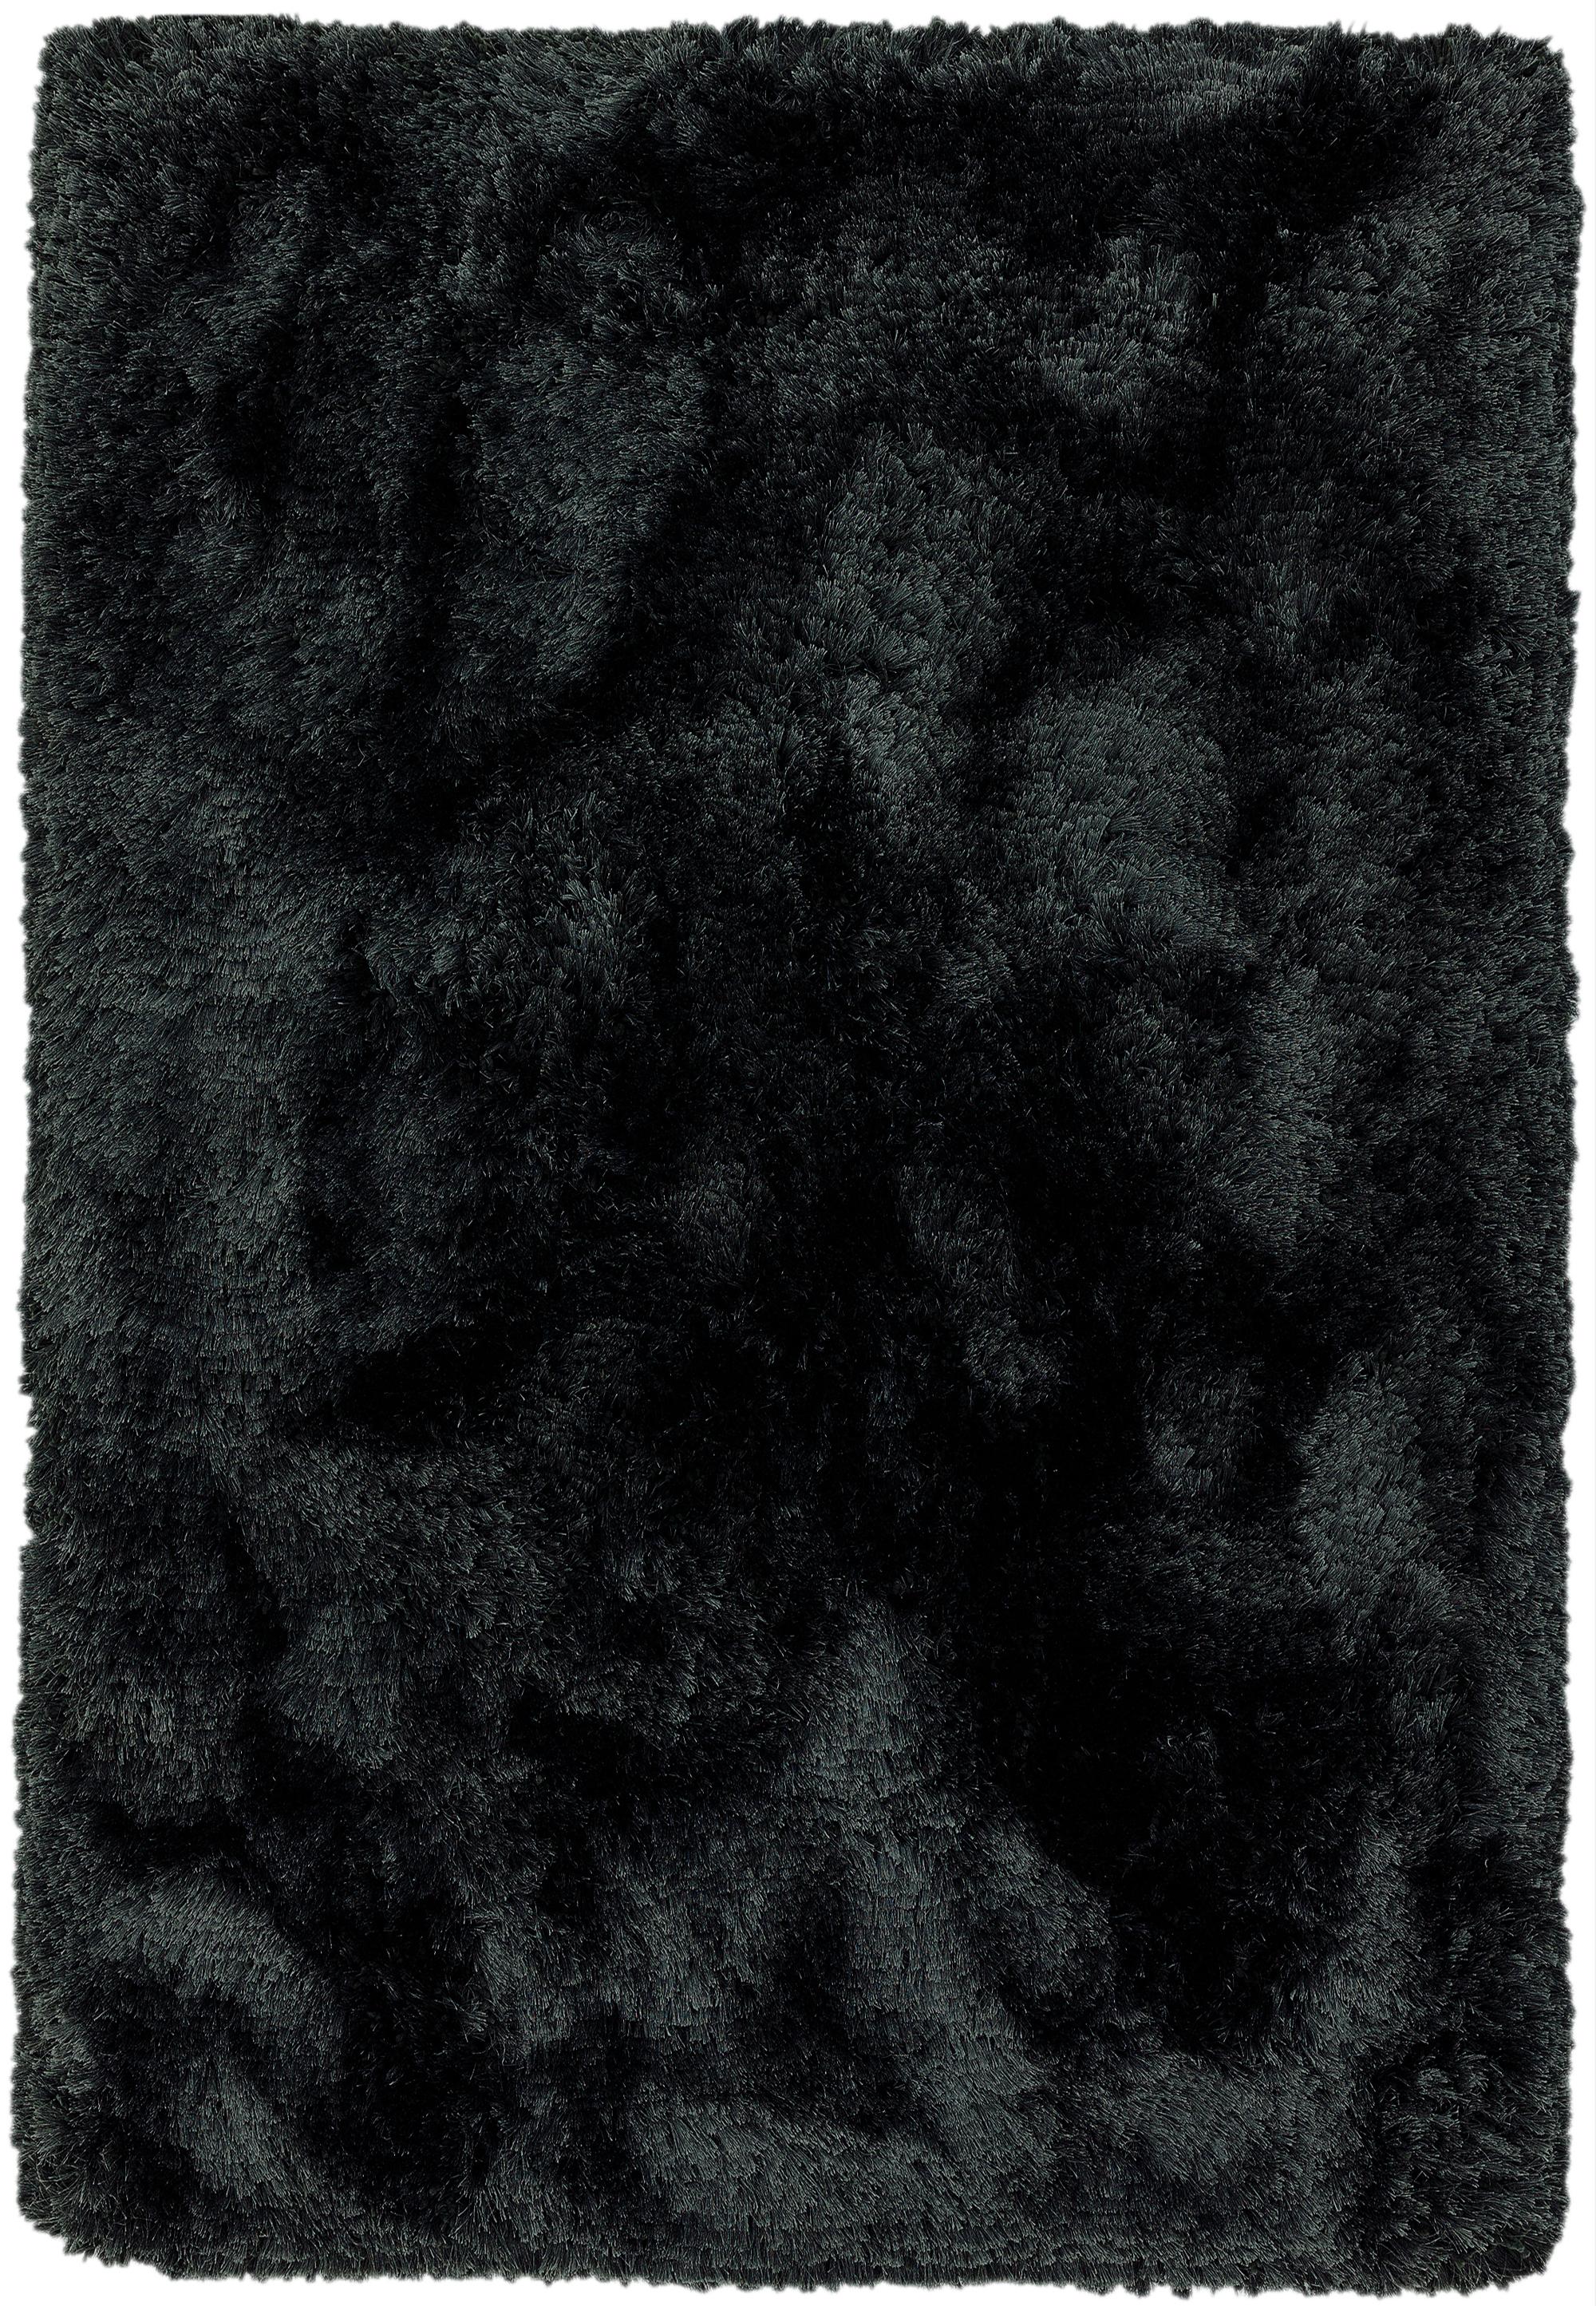 Plush Rug Black